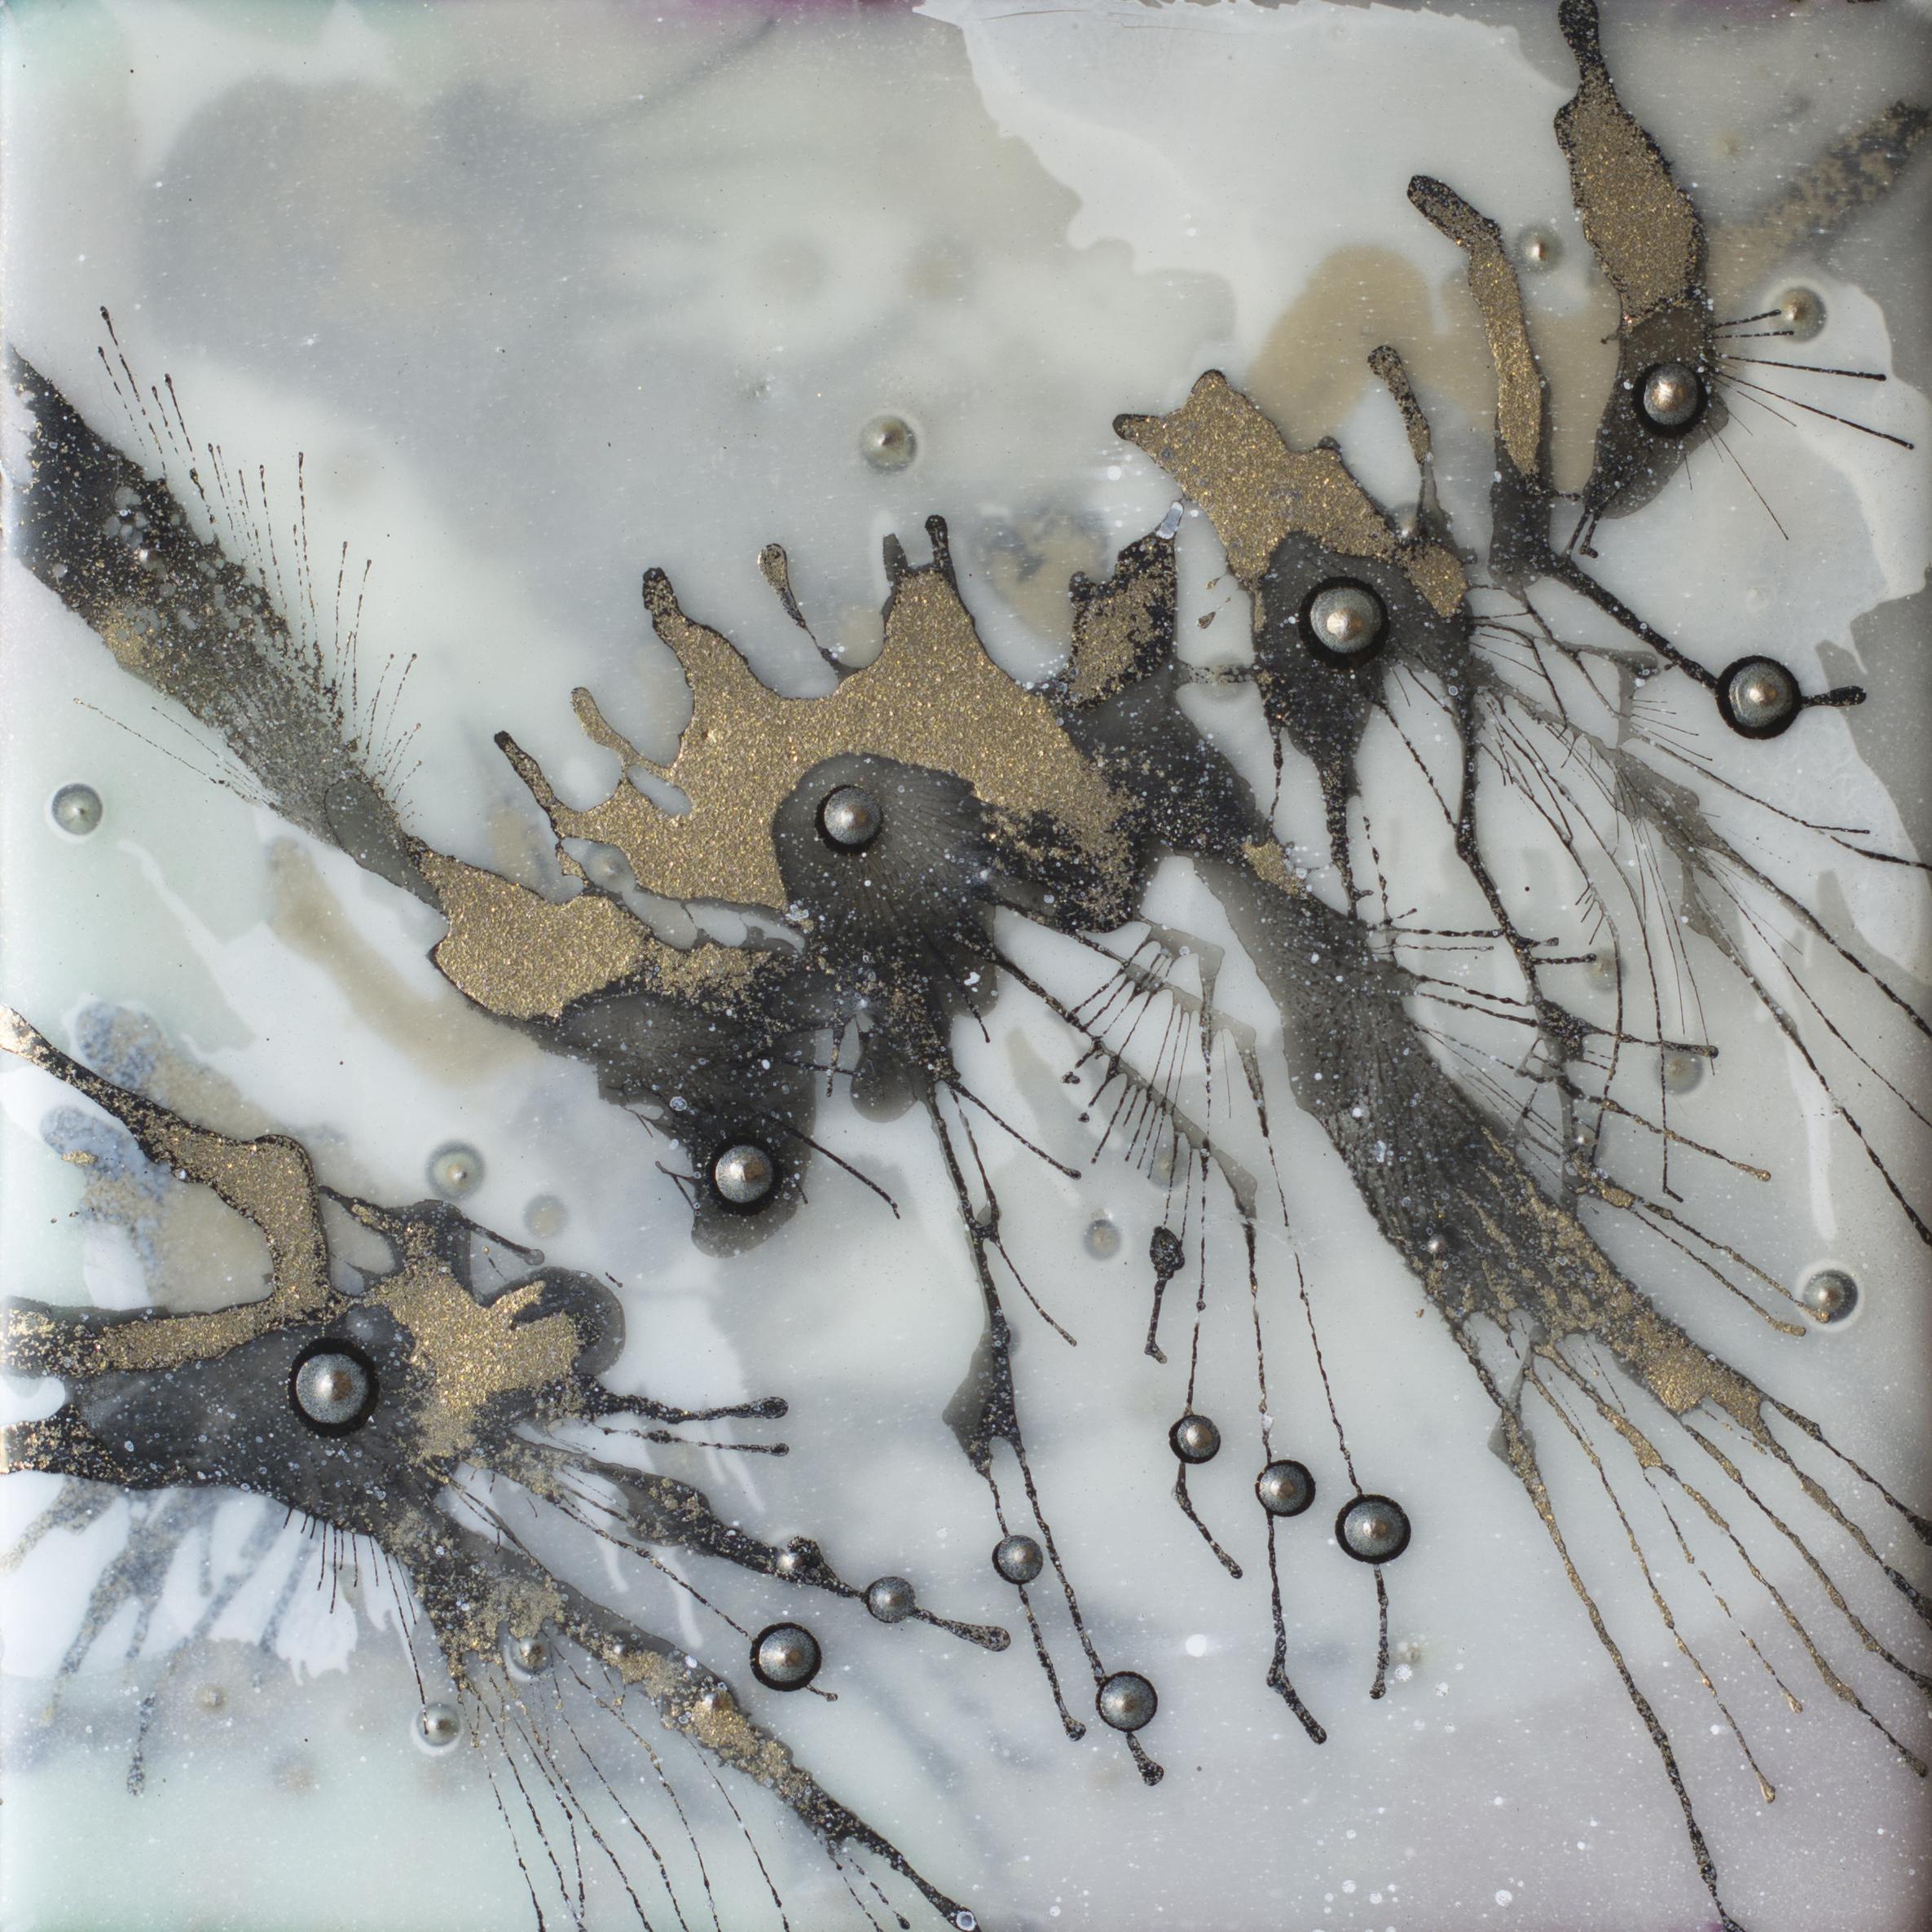 The Regeneration of Neurons No. 9